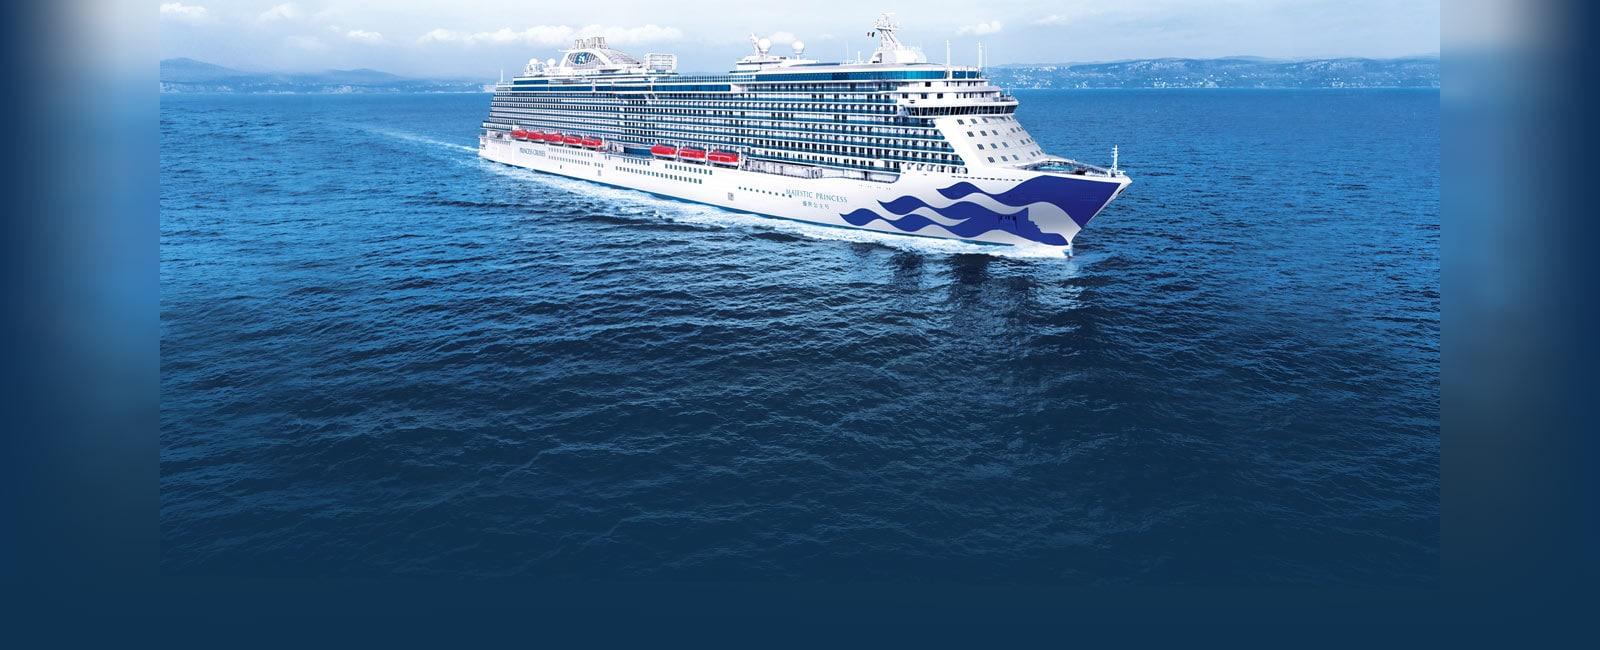 Company Information - Princess Cruises